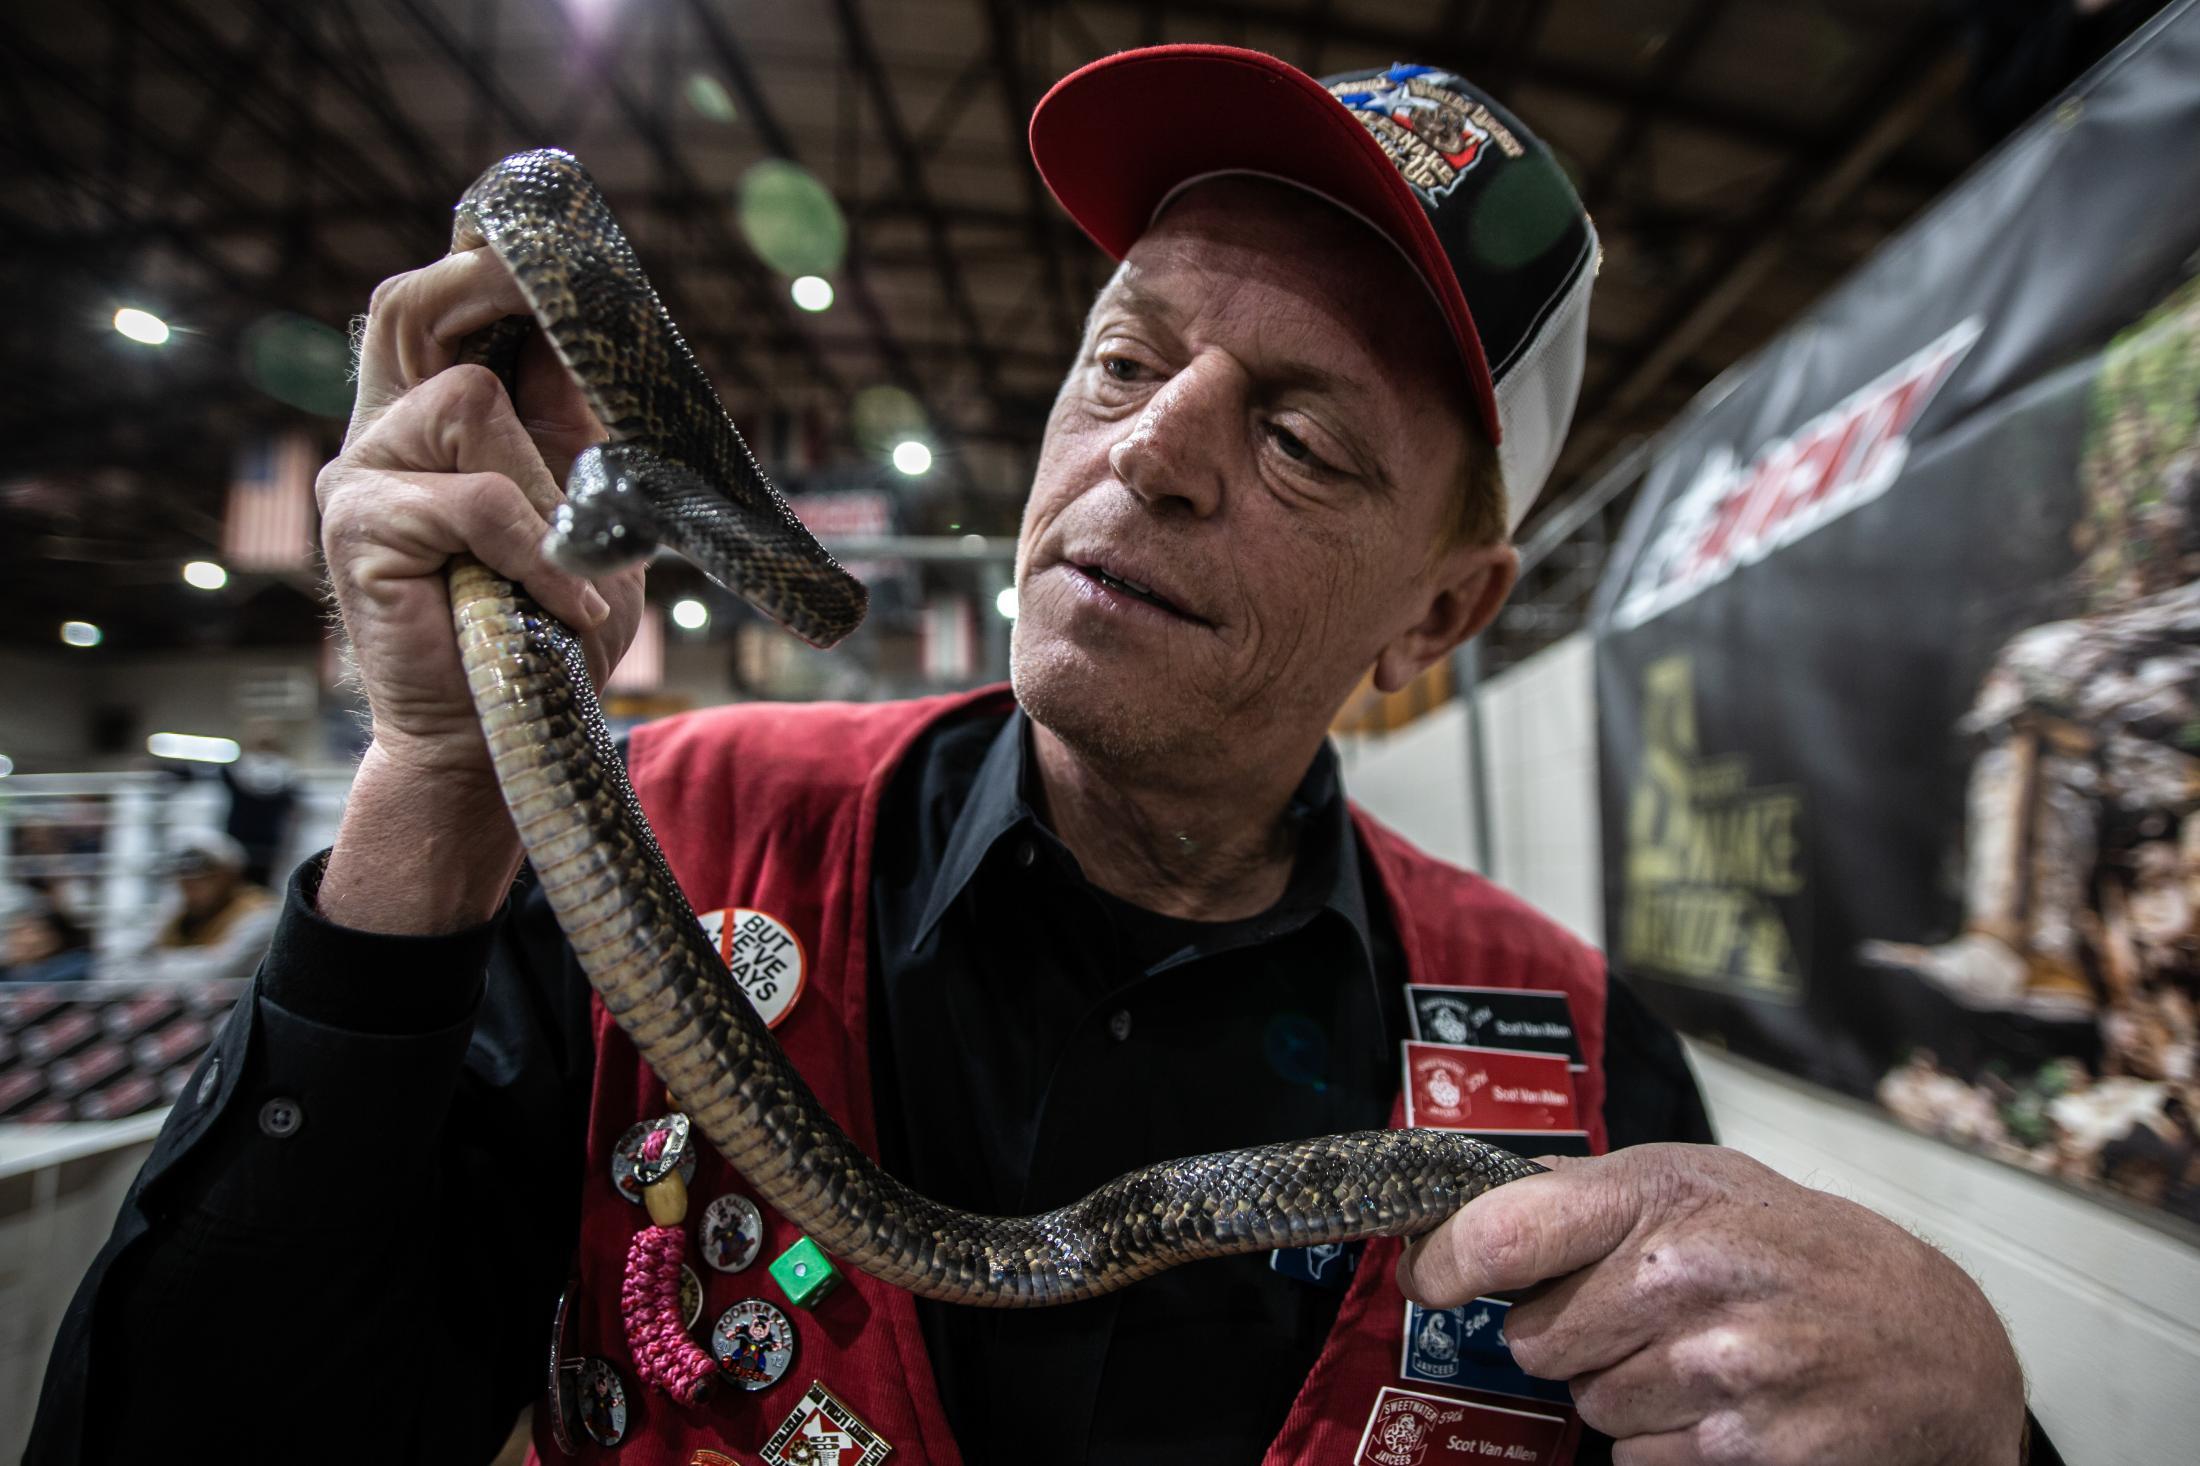 Scot Van Allen, a Jaycee Member, displays a snake showing visitors of the 2020 Rattlesnake Roundup.